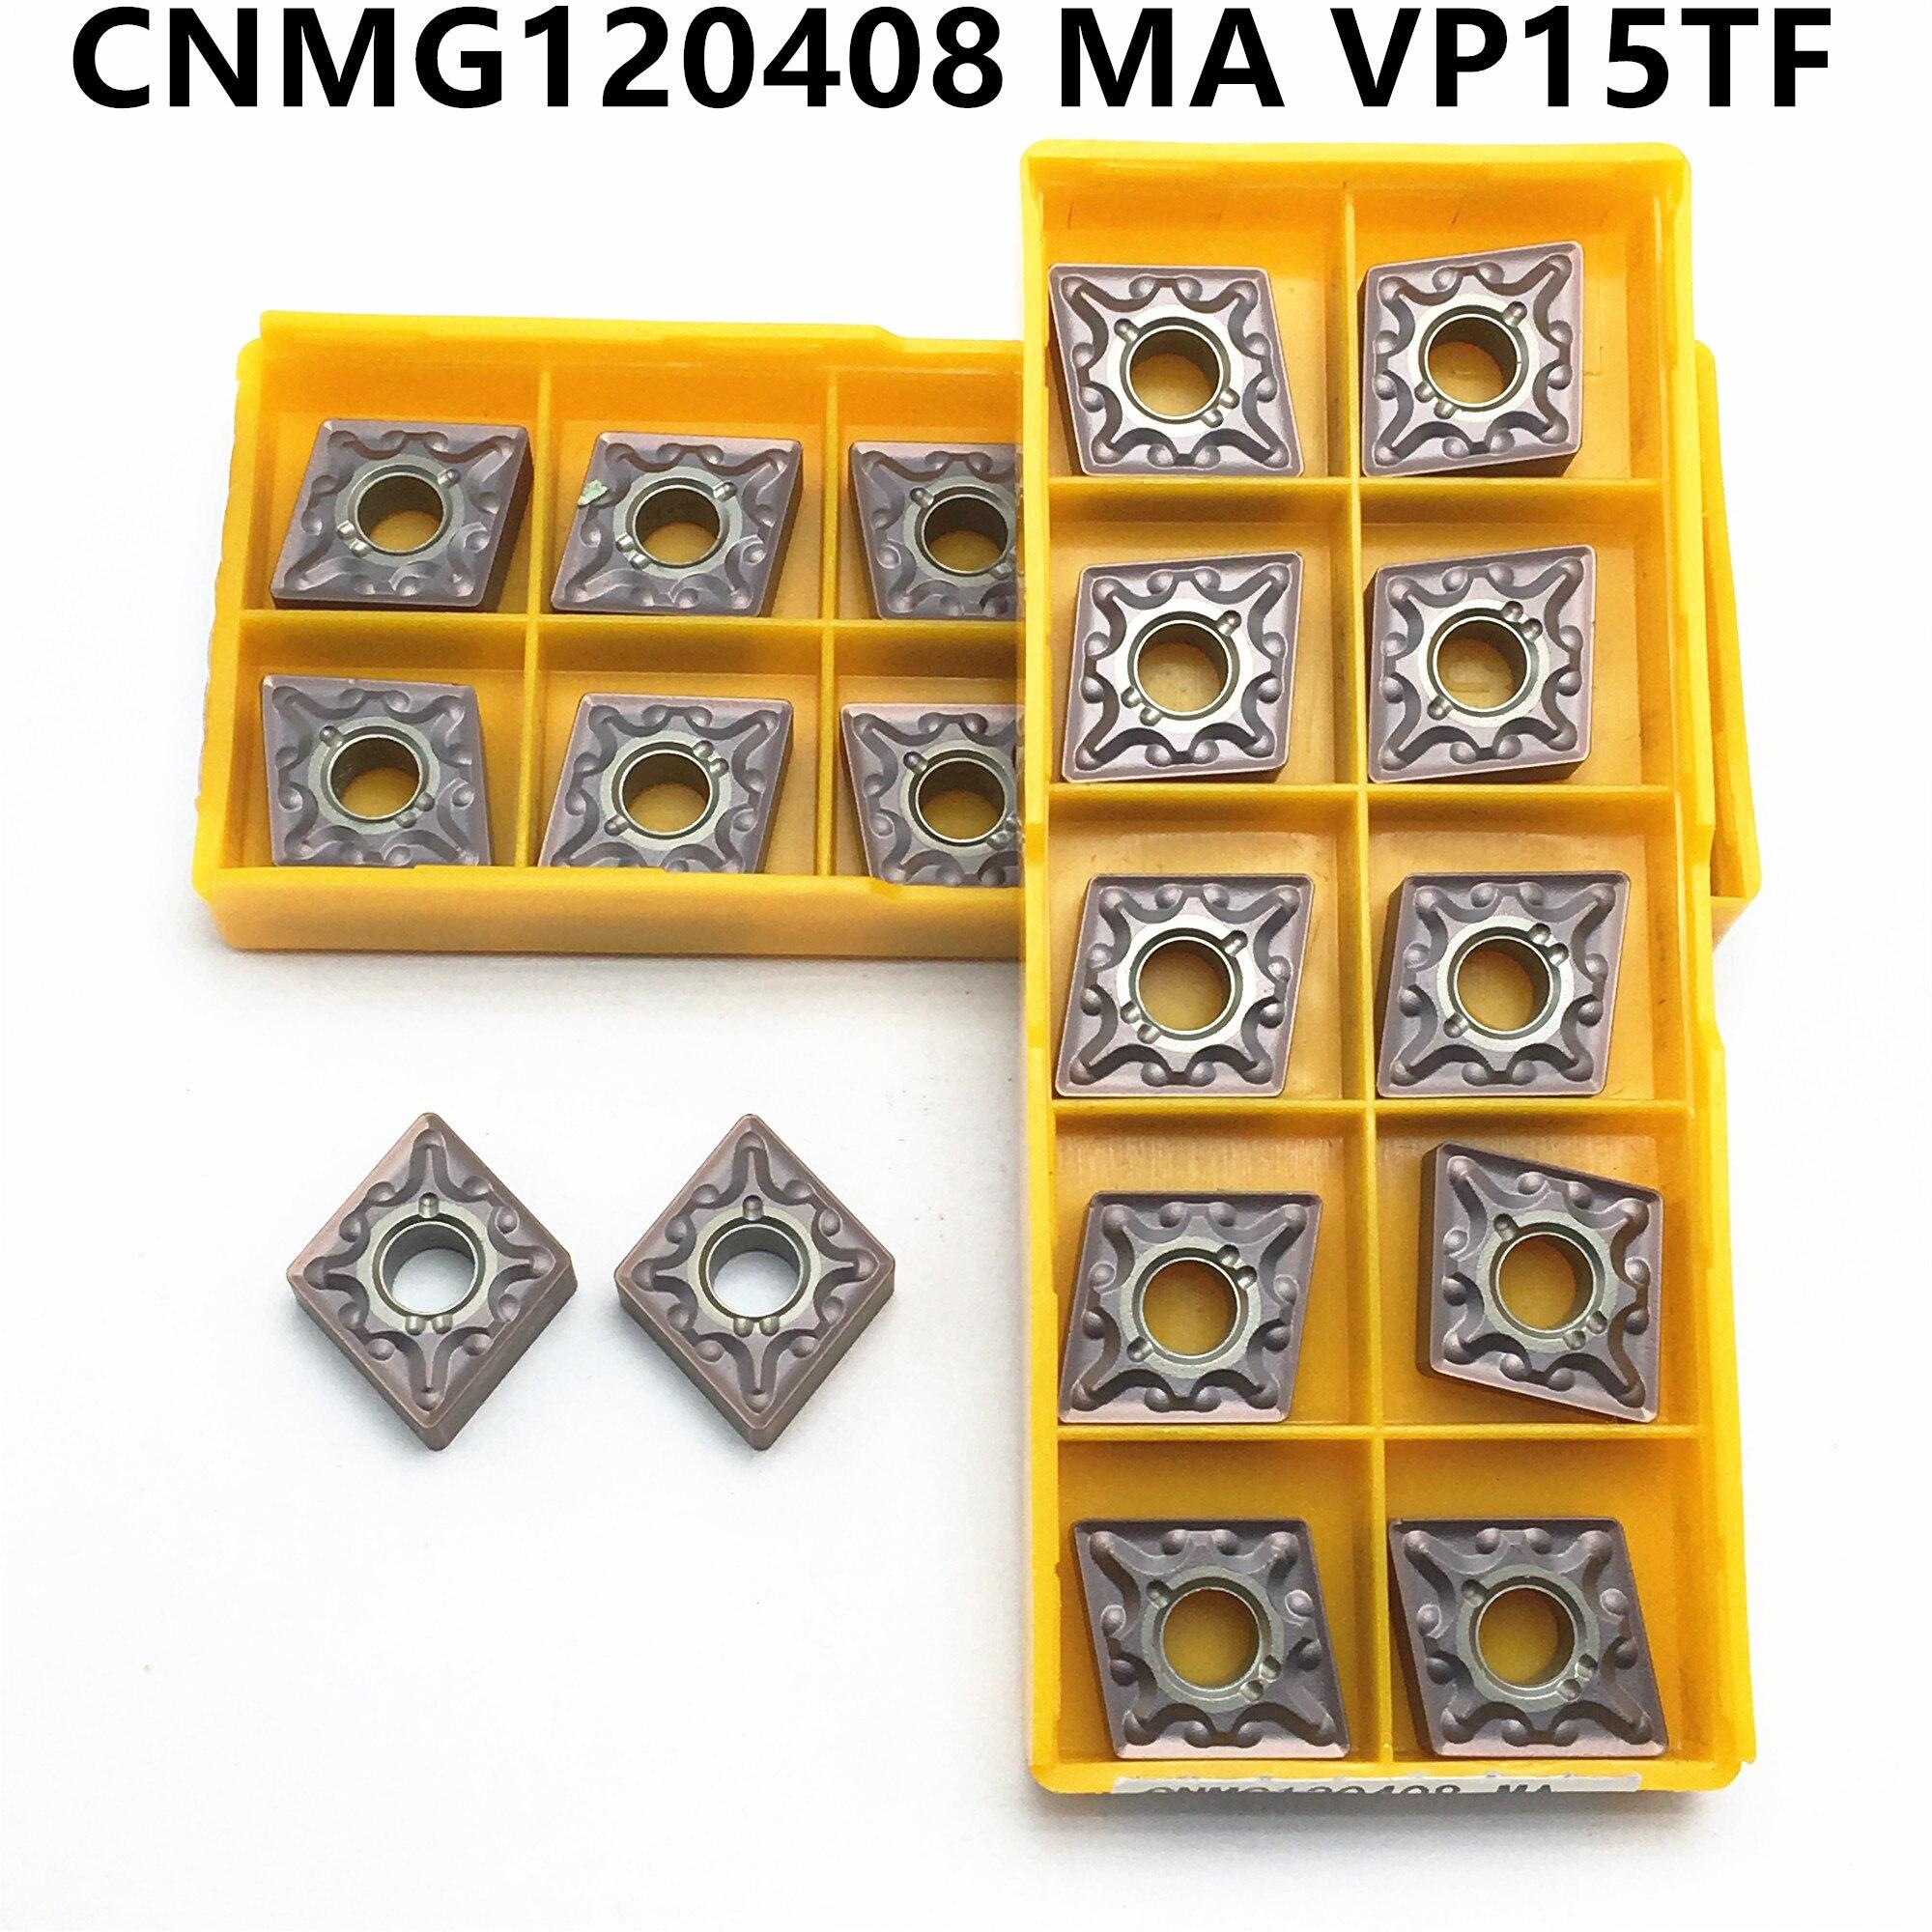 10PCS CNMG120408 MA VP15TF External Turning Insert Carbide Insert CNMG 120408 Milling Tool CNC Lathe Tool